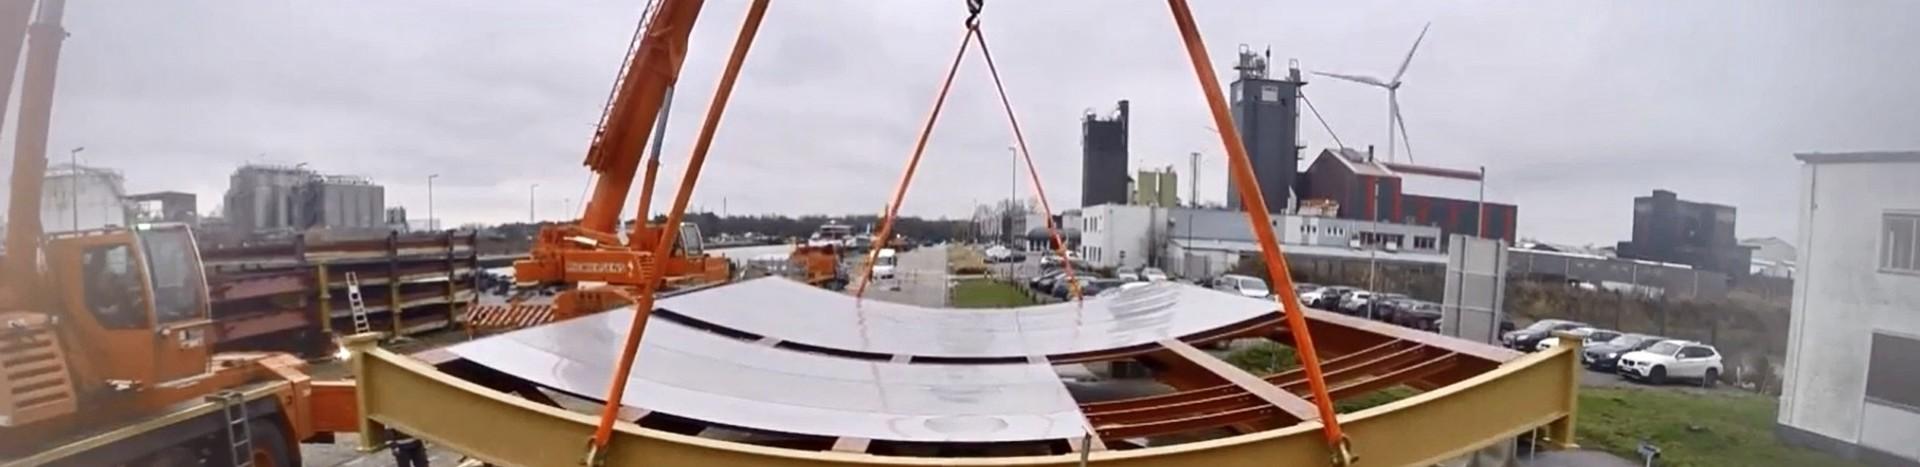 Roundslings 40 ton